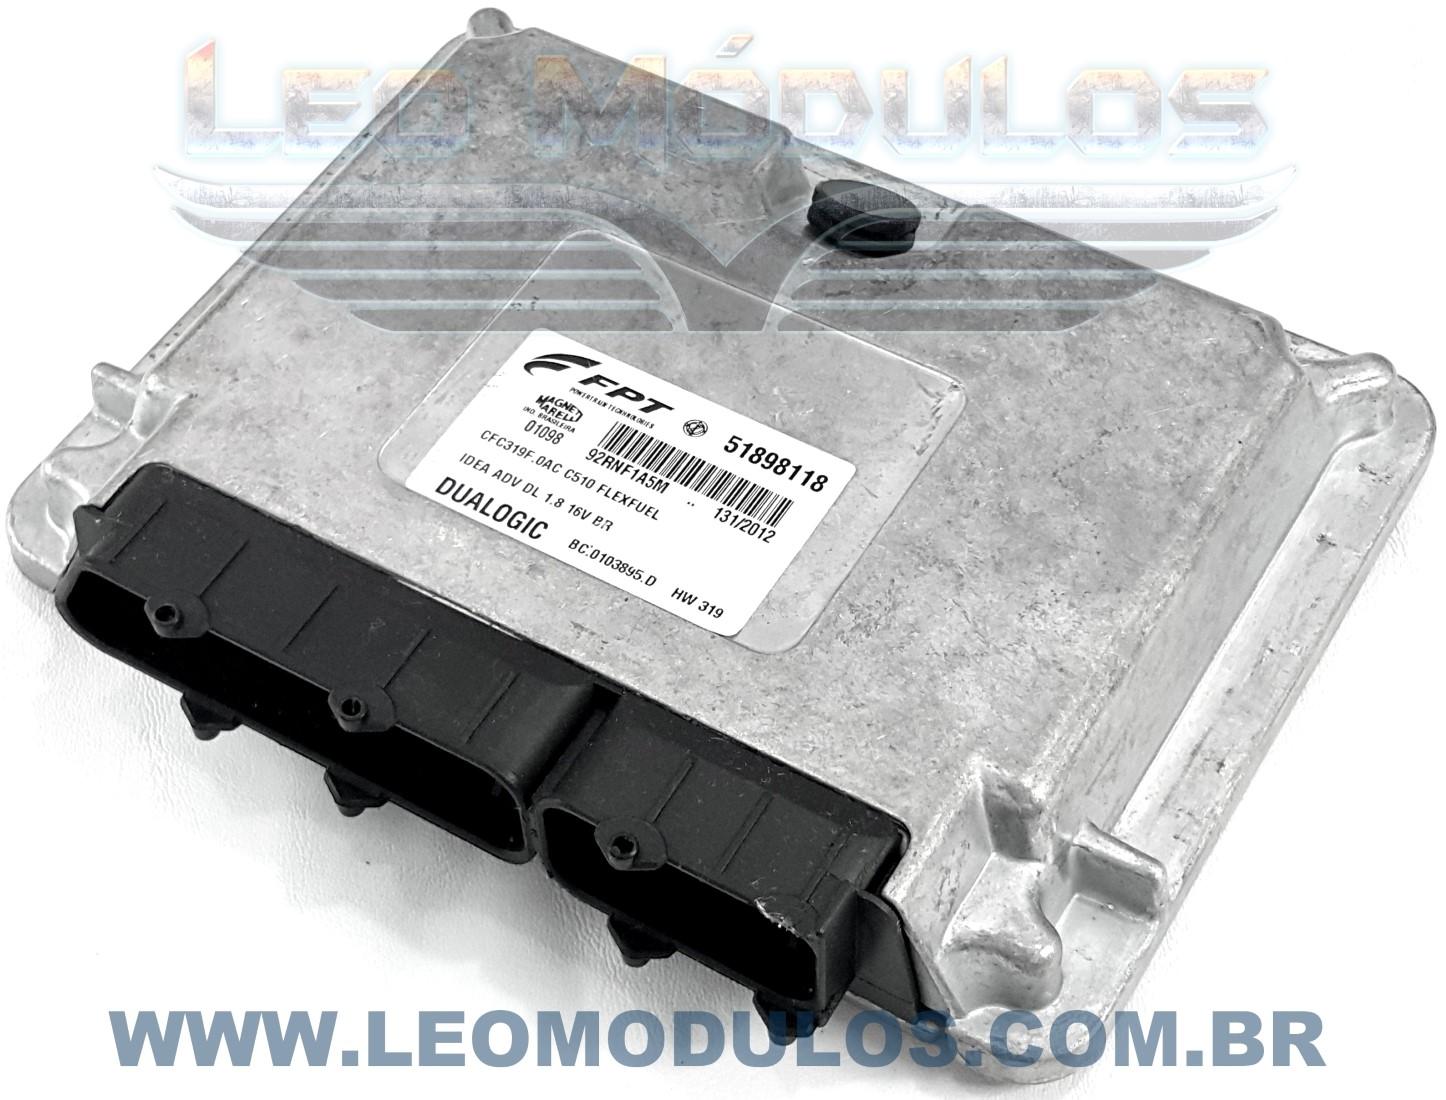 Módulo de Câmbio Automático - Marelli CFC319F.0AC - 51898118 - Fiat Idea Adventure 1.8 16V Flex Dualogic - BC.0103895.D CFC319F0AC - Leo Módulos